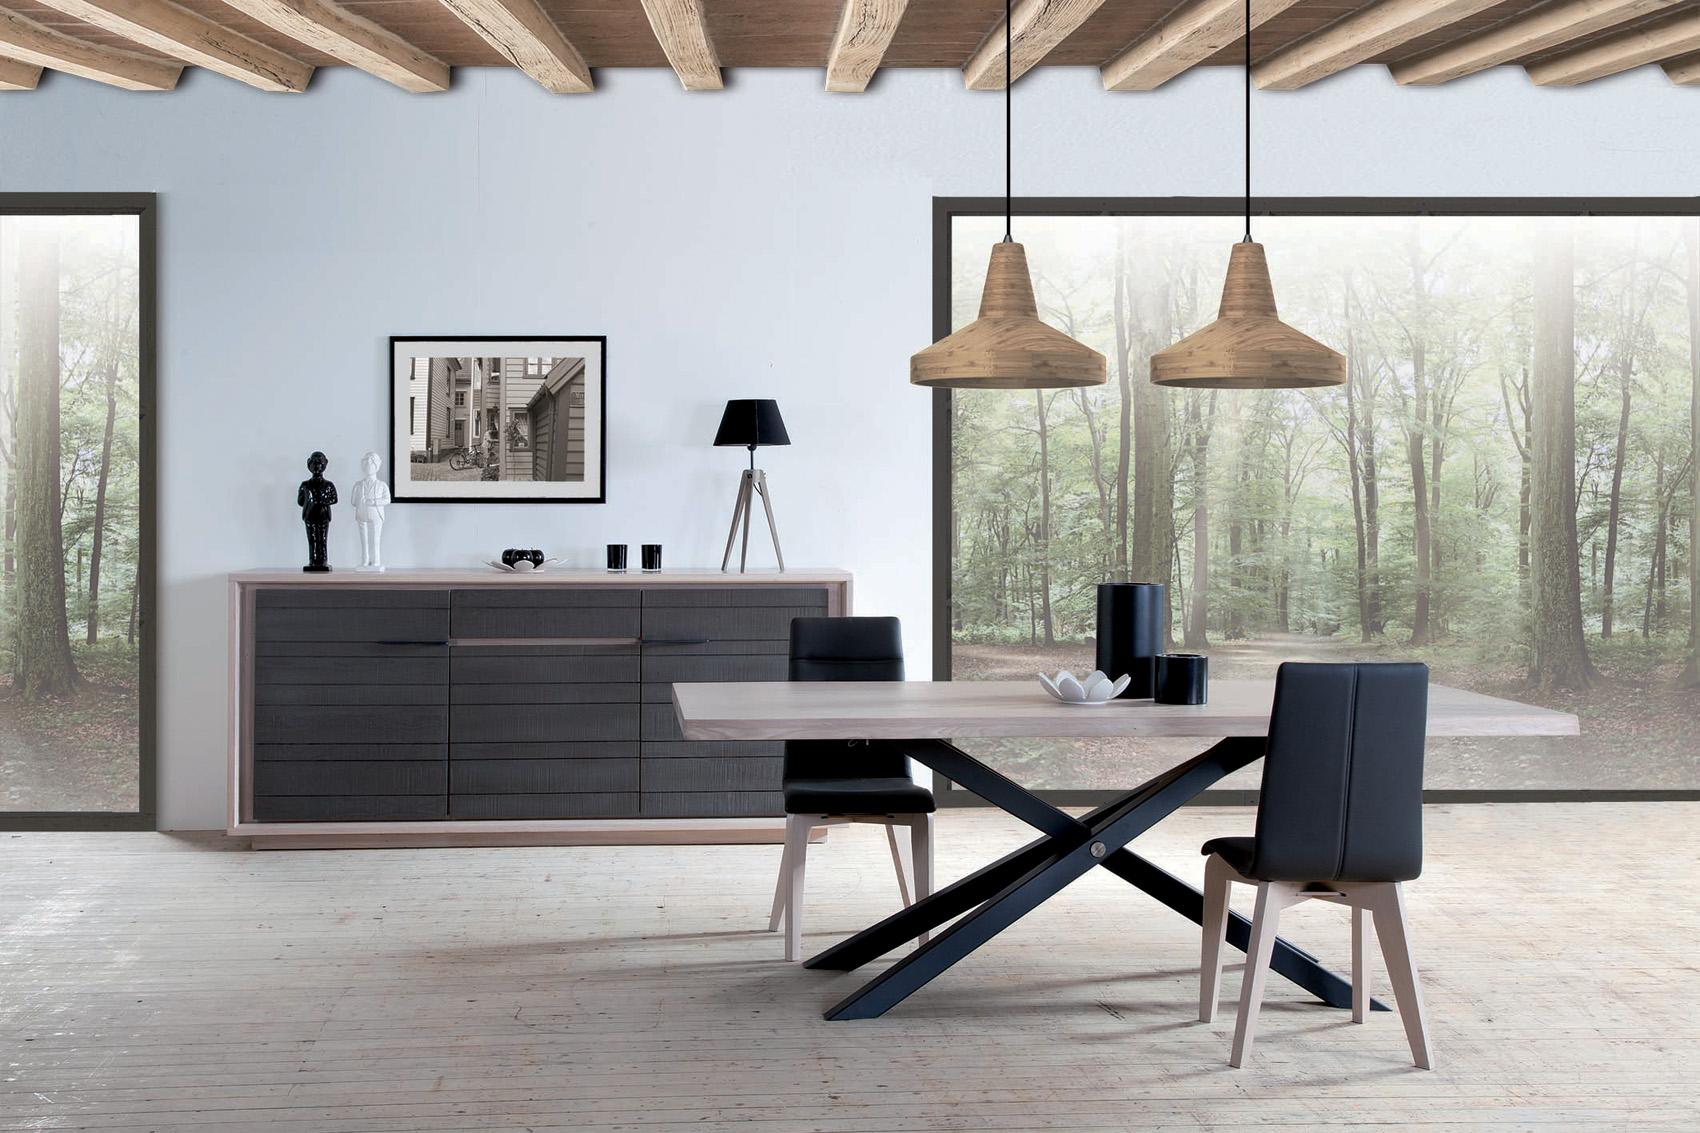 Chaise zen meubles gibaud for Salle a manger zen